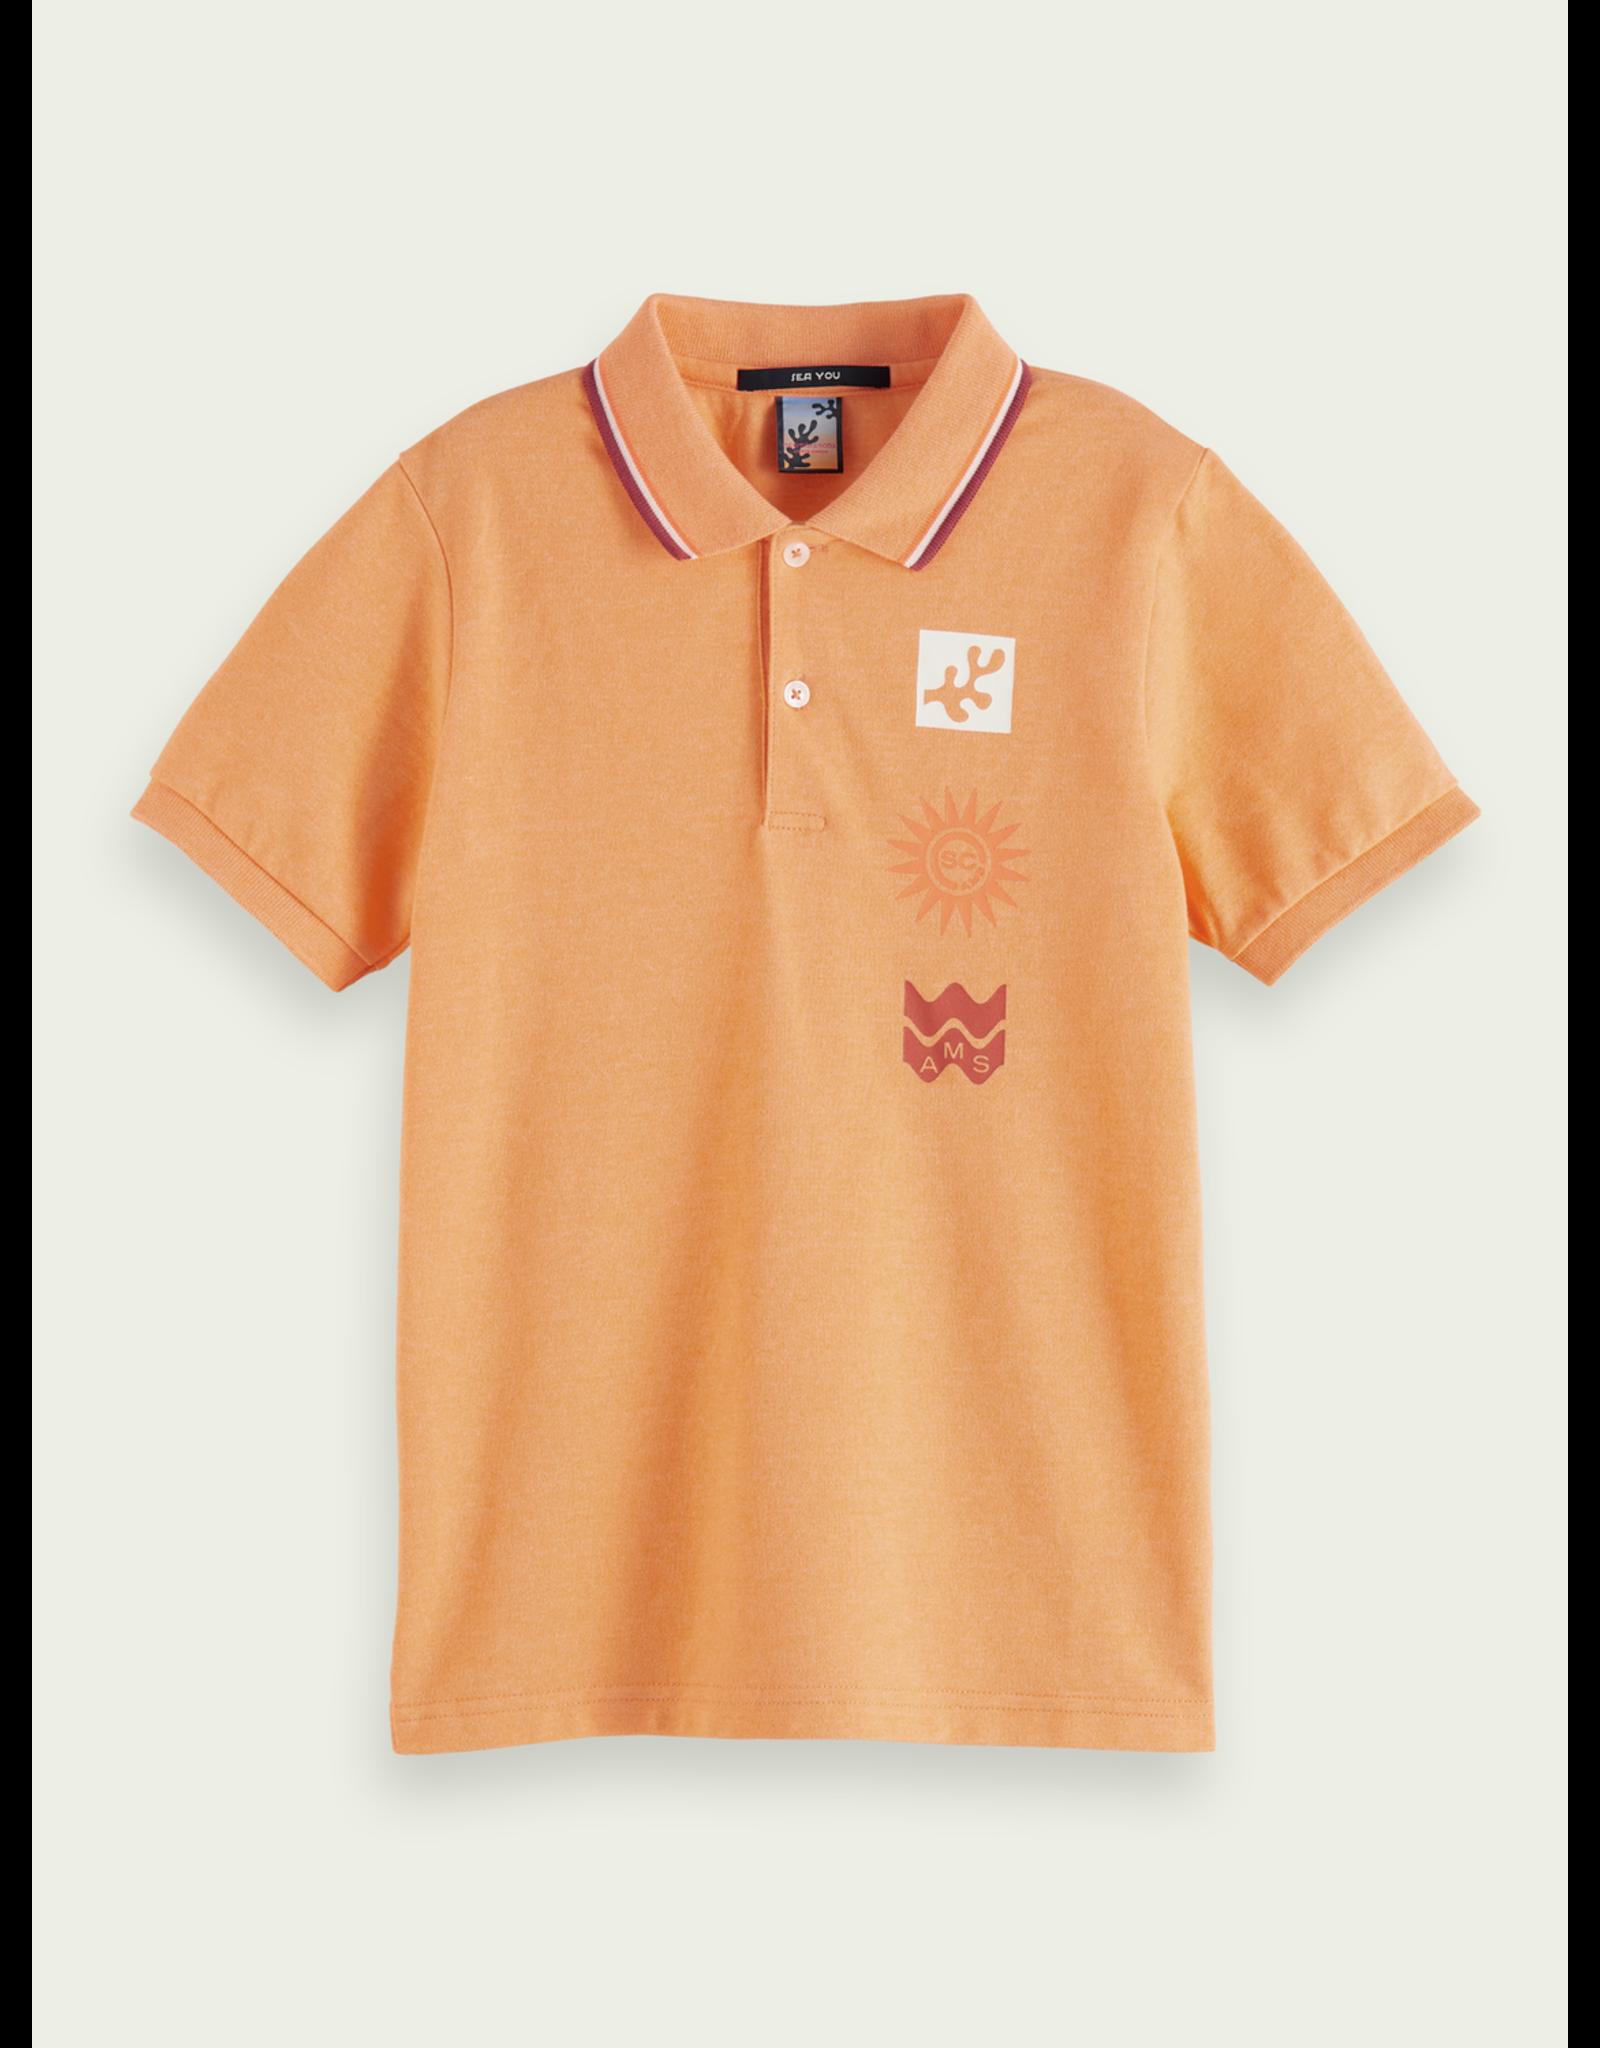 Scotch & Soda S&S polo oranje artwork